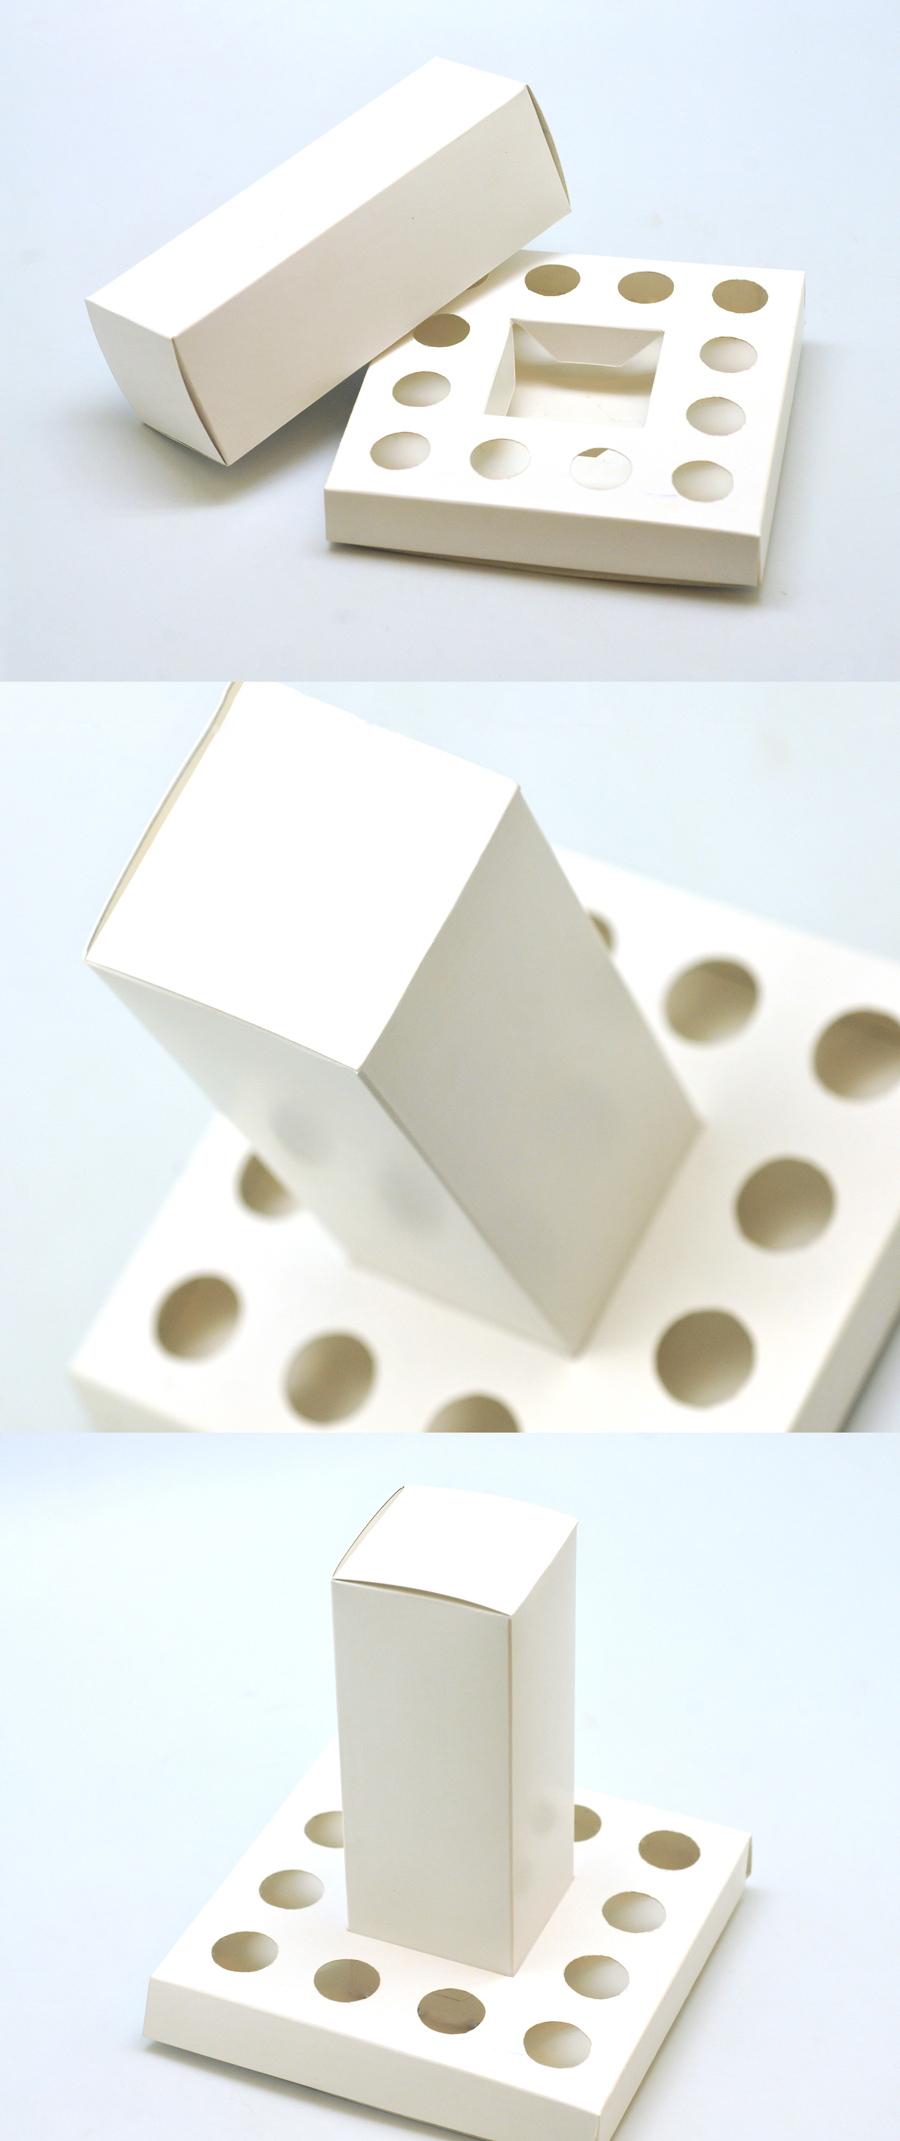 cosmatic-packaging1459252157